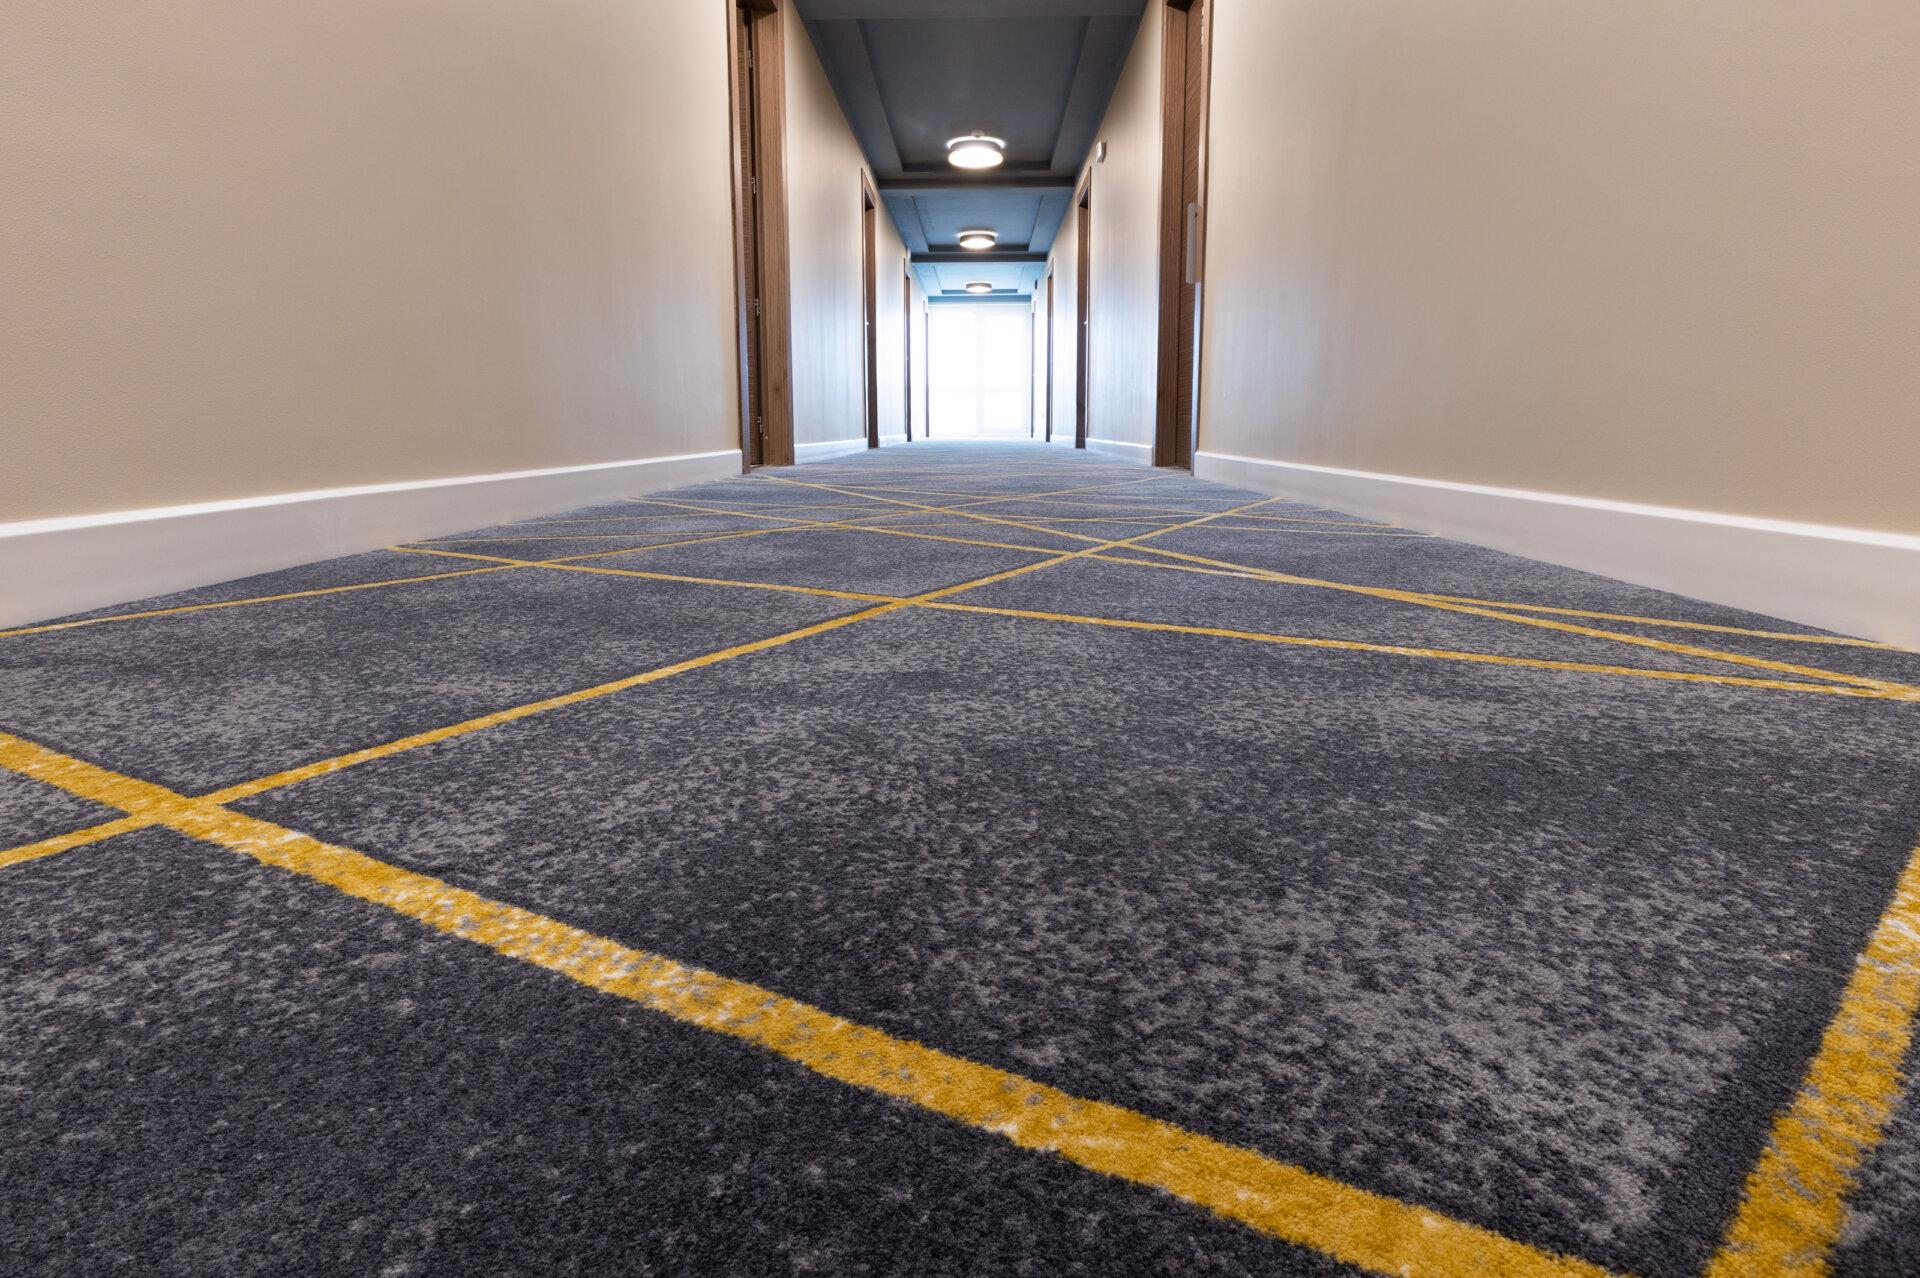 20210609-carpet&more-mercure-hotel-galati-by-hugmedia-13